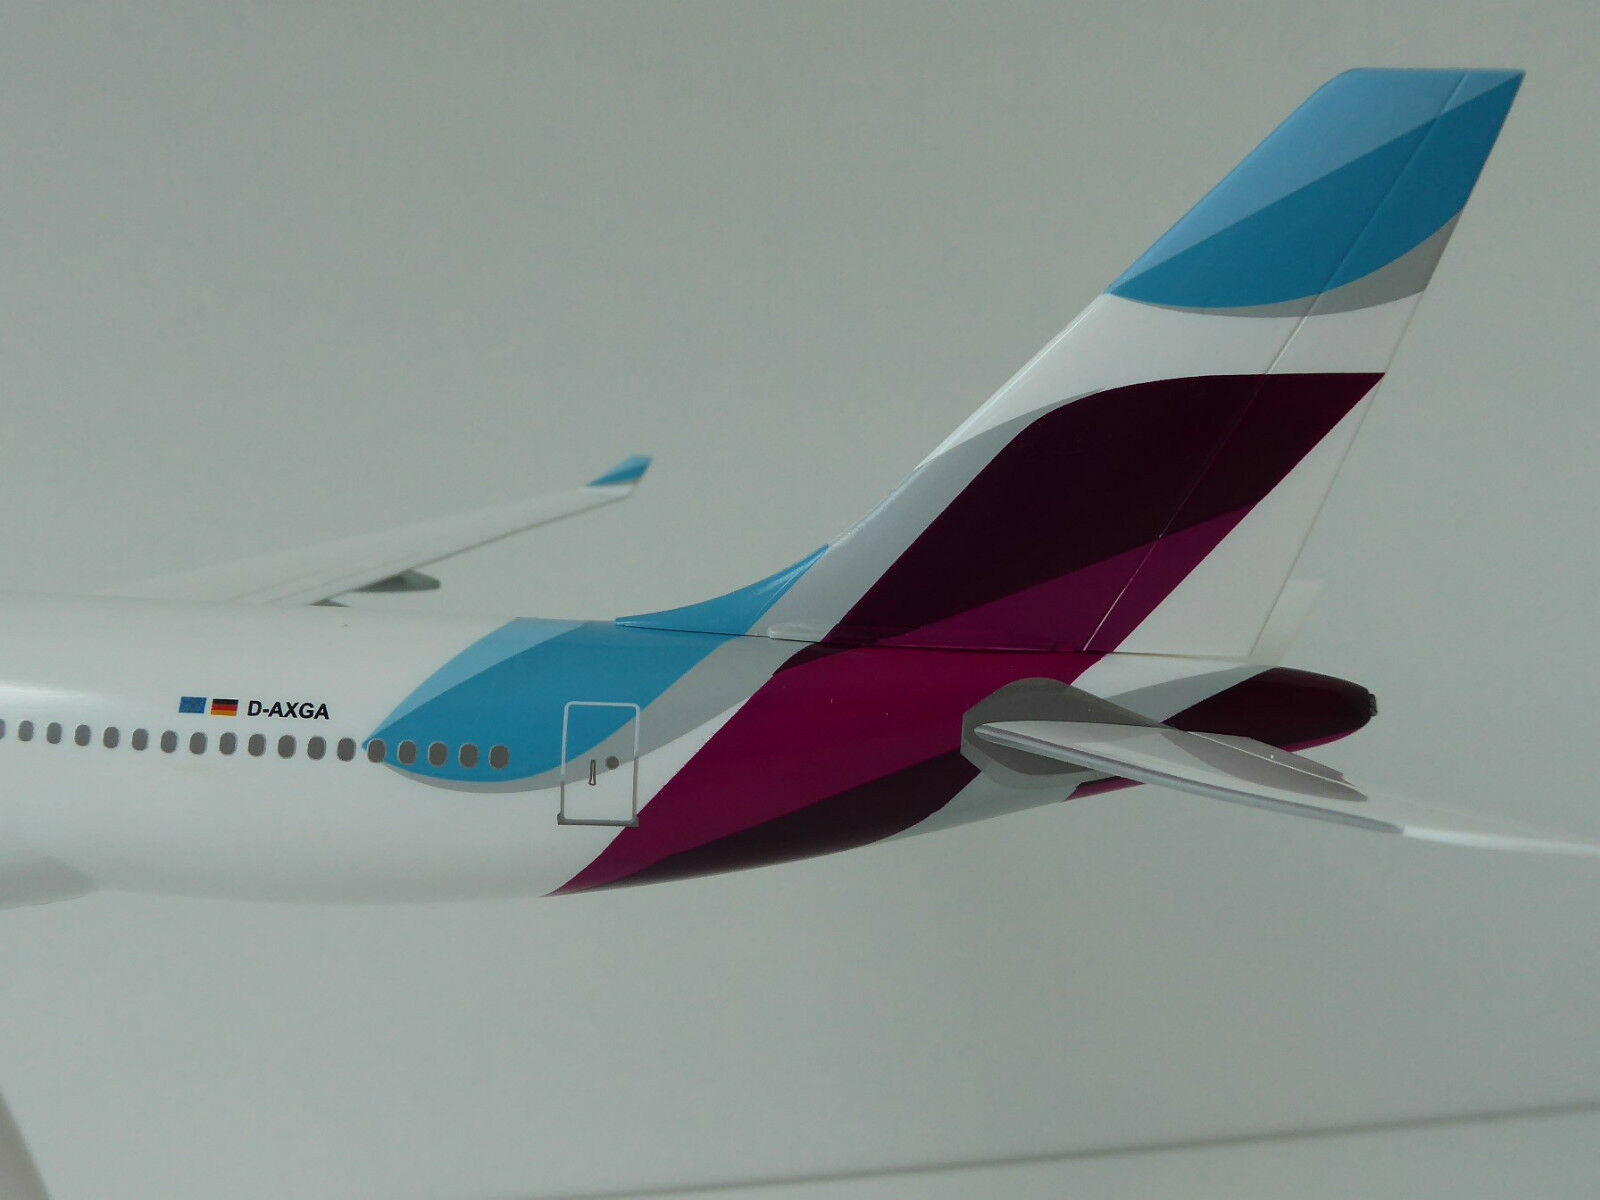 EUROWINGS Airbus A330-200 1 1 1 200 new colours Limox Wings EW03 A330 A 330 D-AXGA e800da